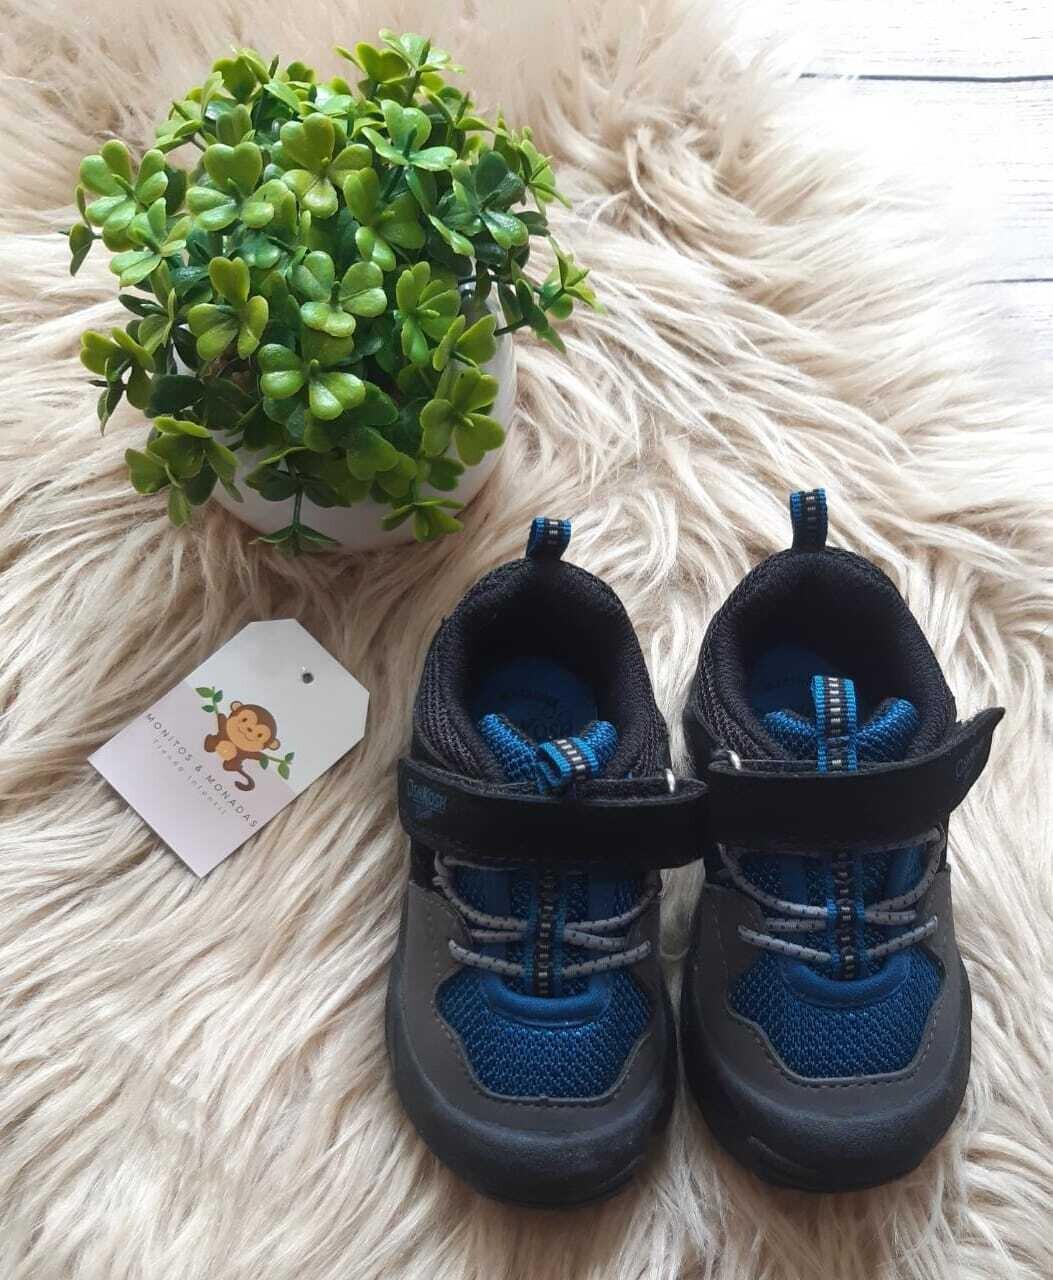 Zapatos Oshkosh azules y negros, Talla 5 us